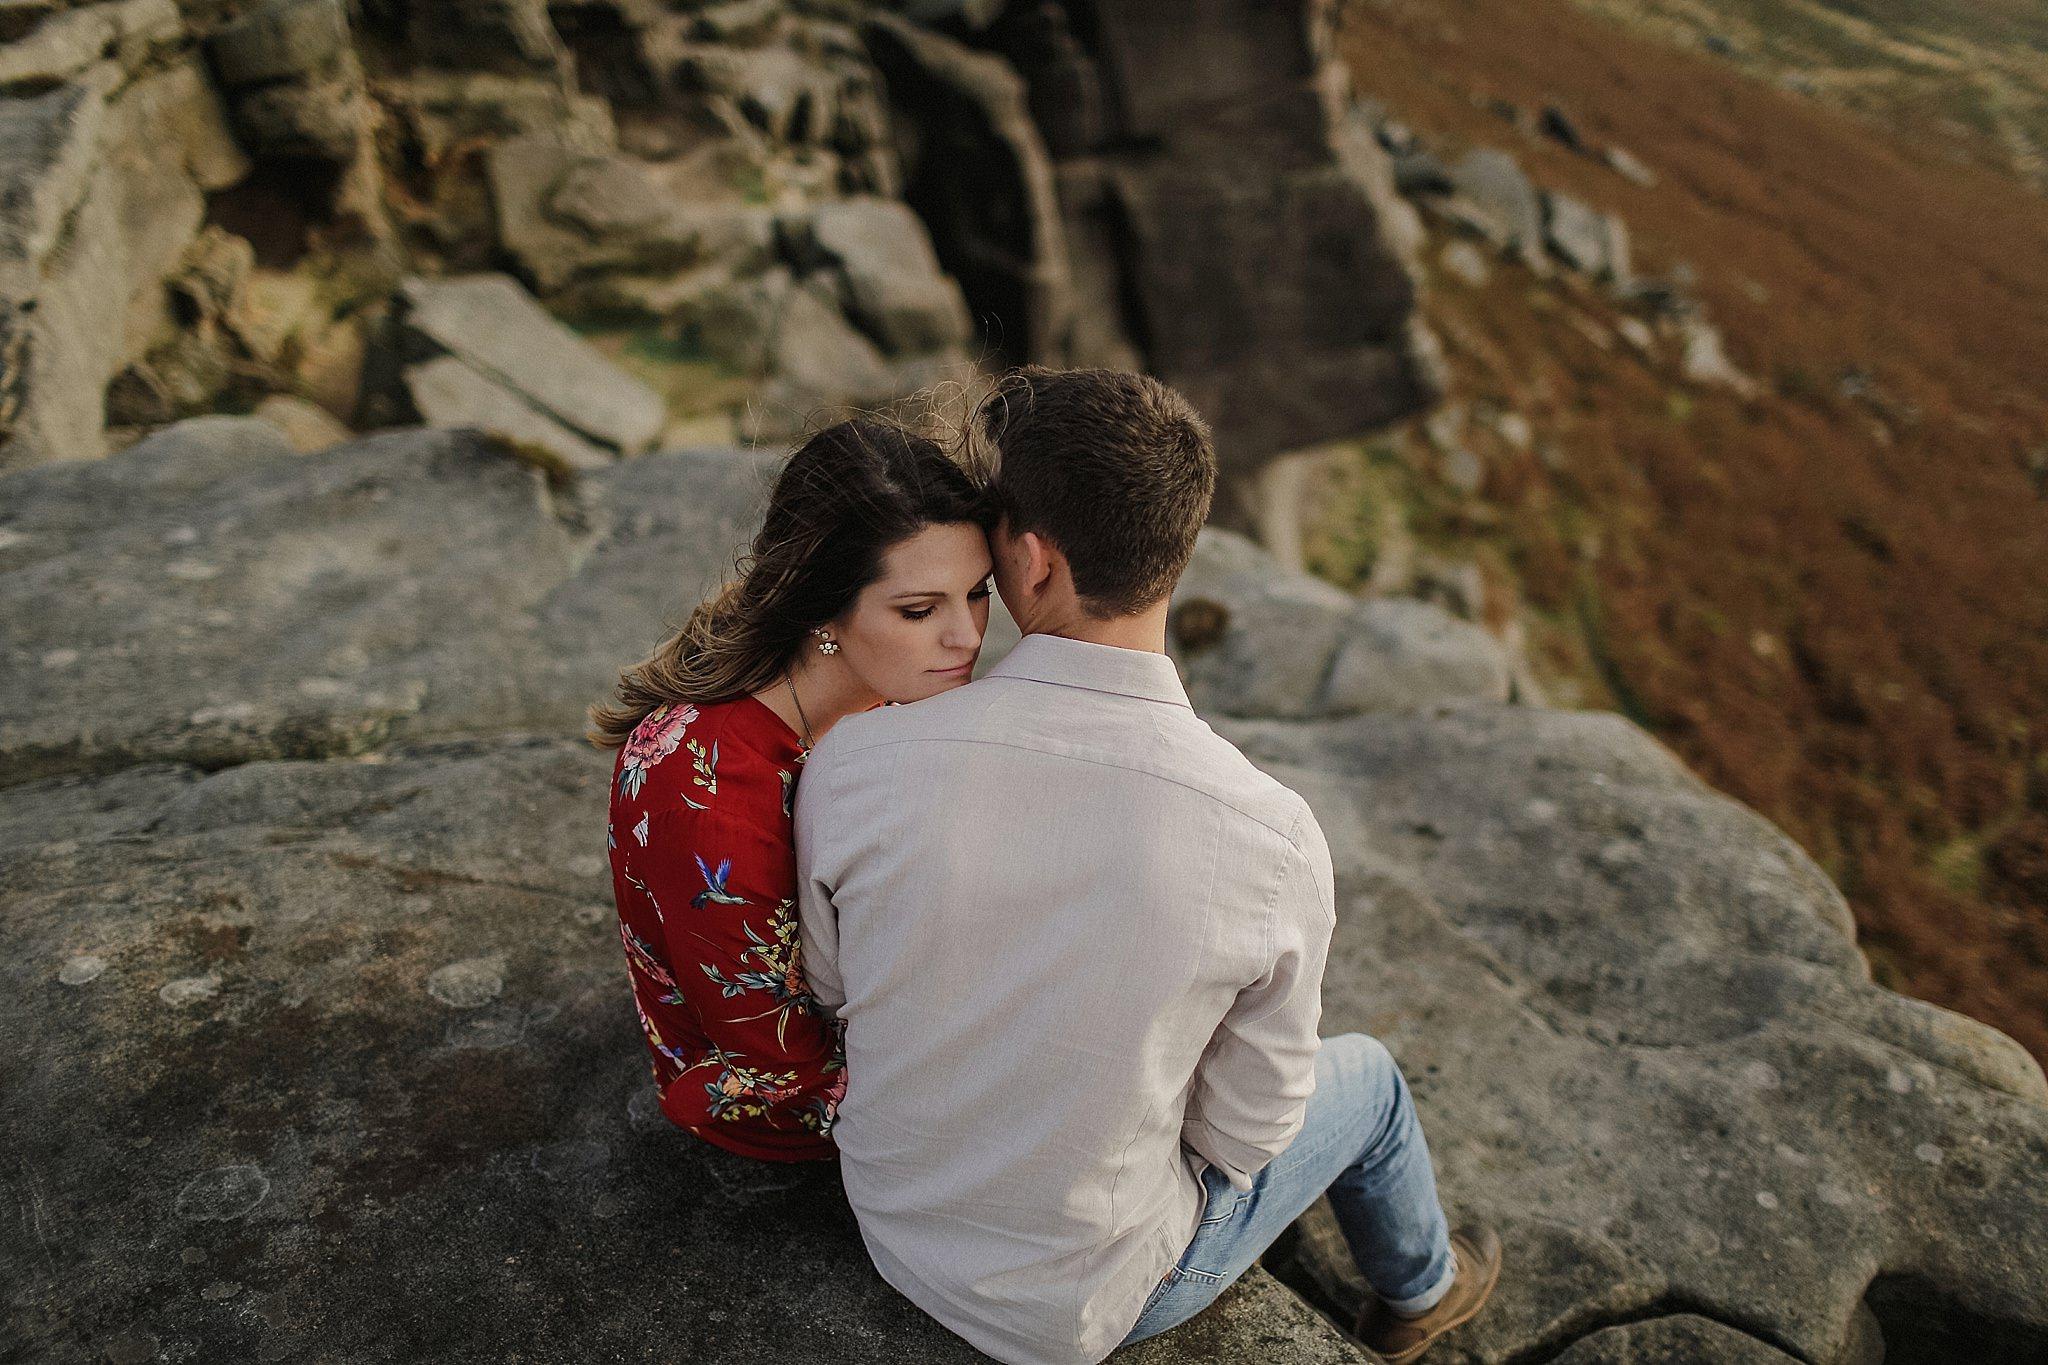 Couple_Portrait_Photographer_Sheffield_0006.jpg